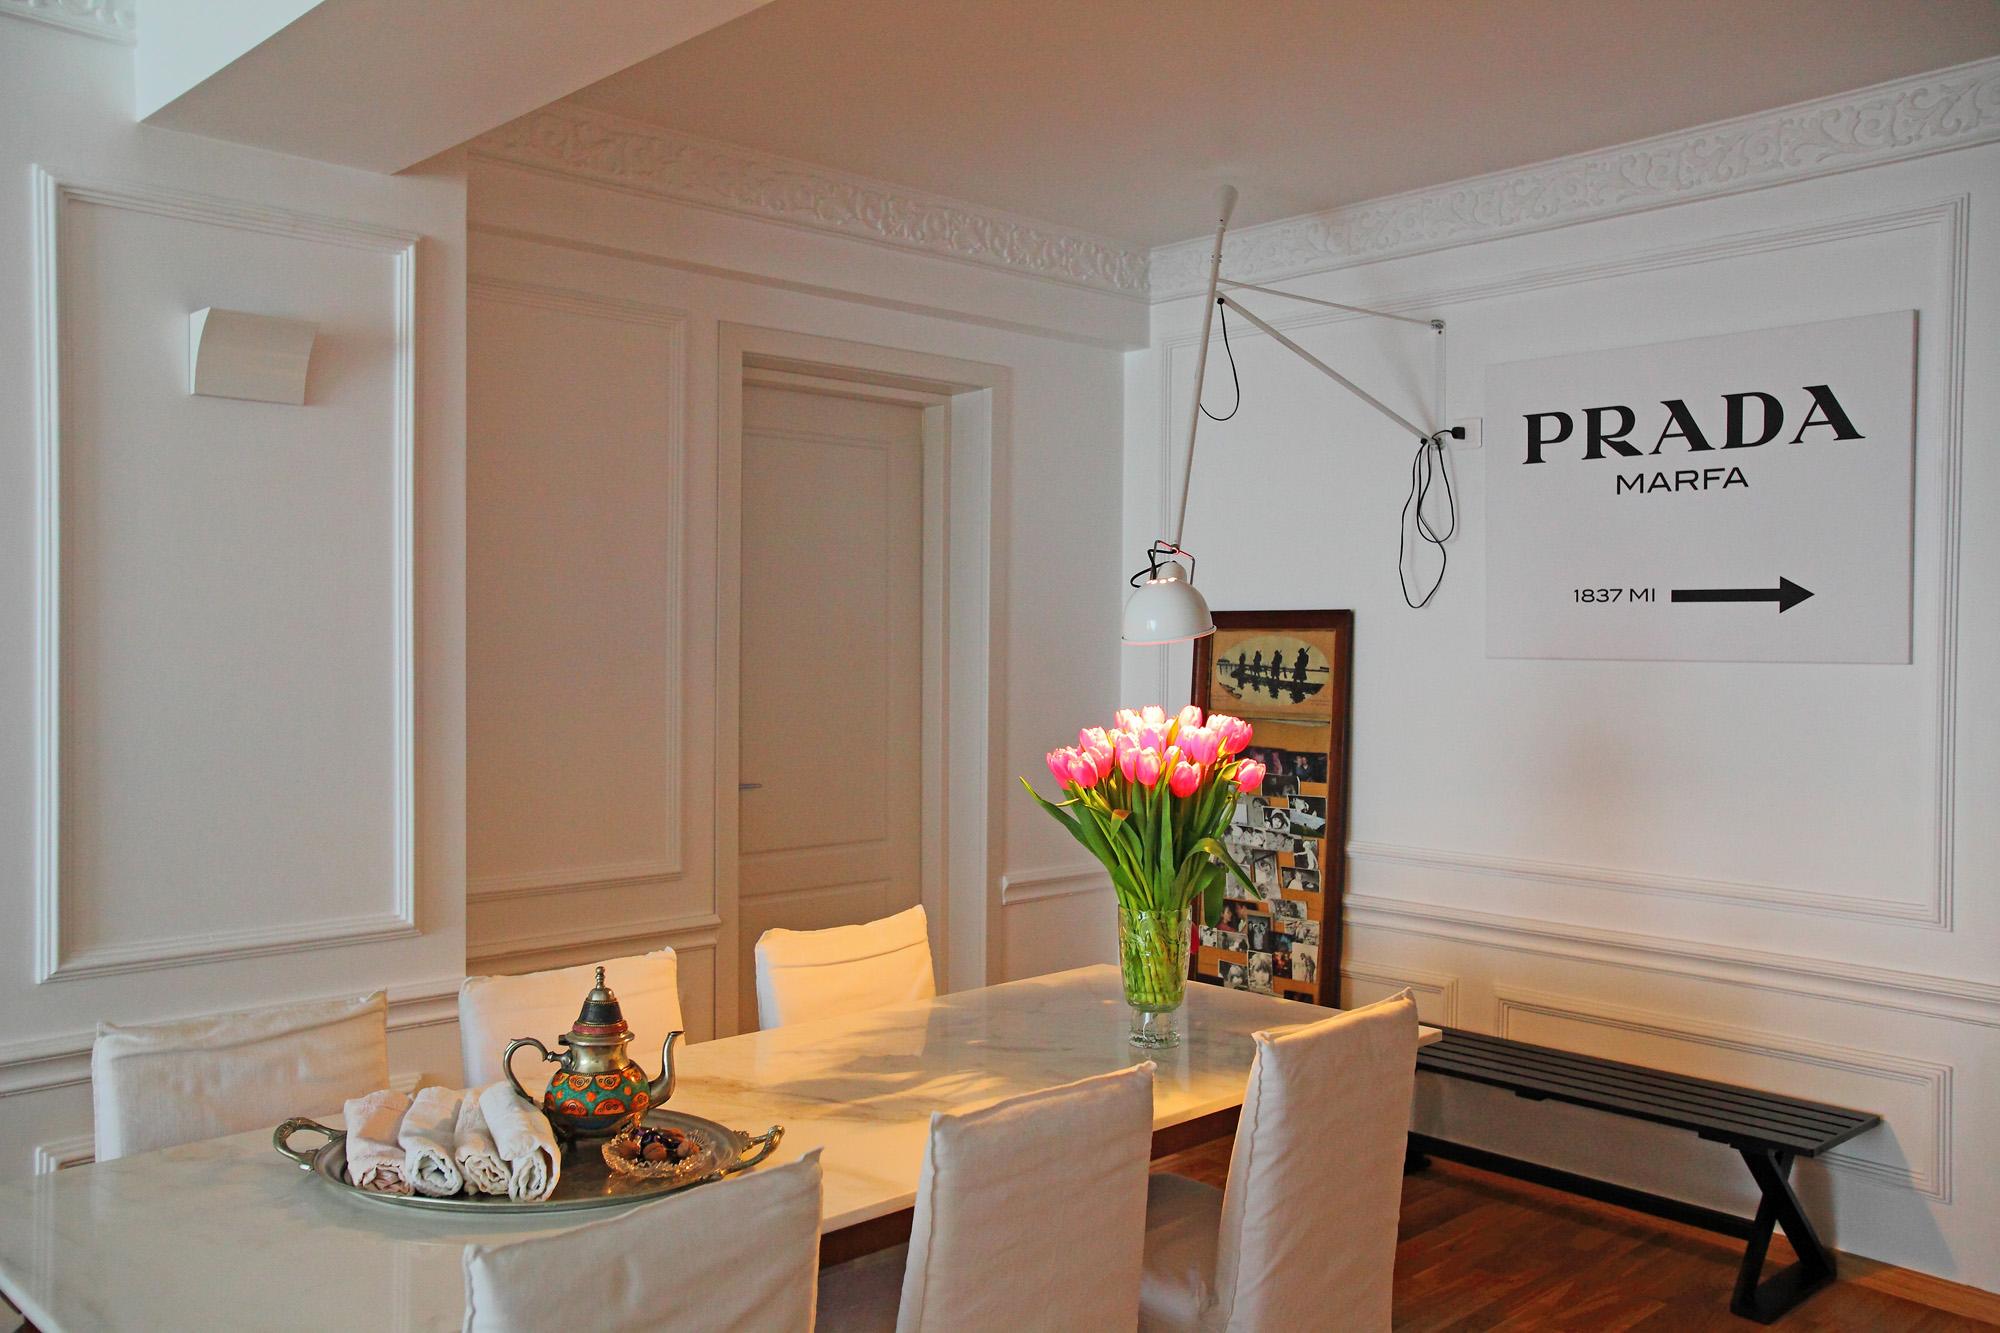 https://ahe-ro.s3.amazonaws.com/12326/apartament-elegant-cu-4-camere-si-terase-generoase-in-centrul-bucurestiului-%2814%29.jpg